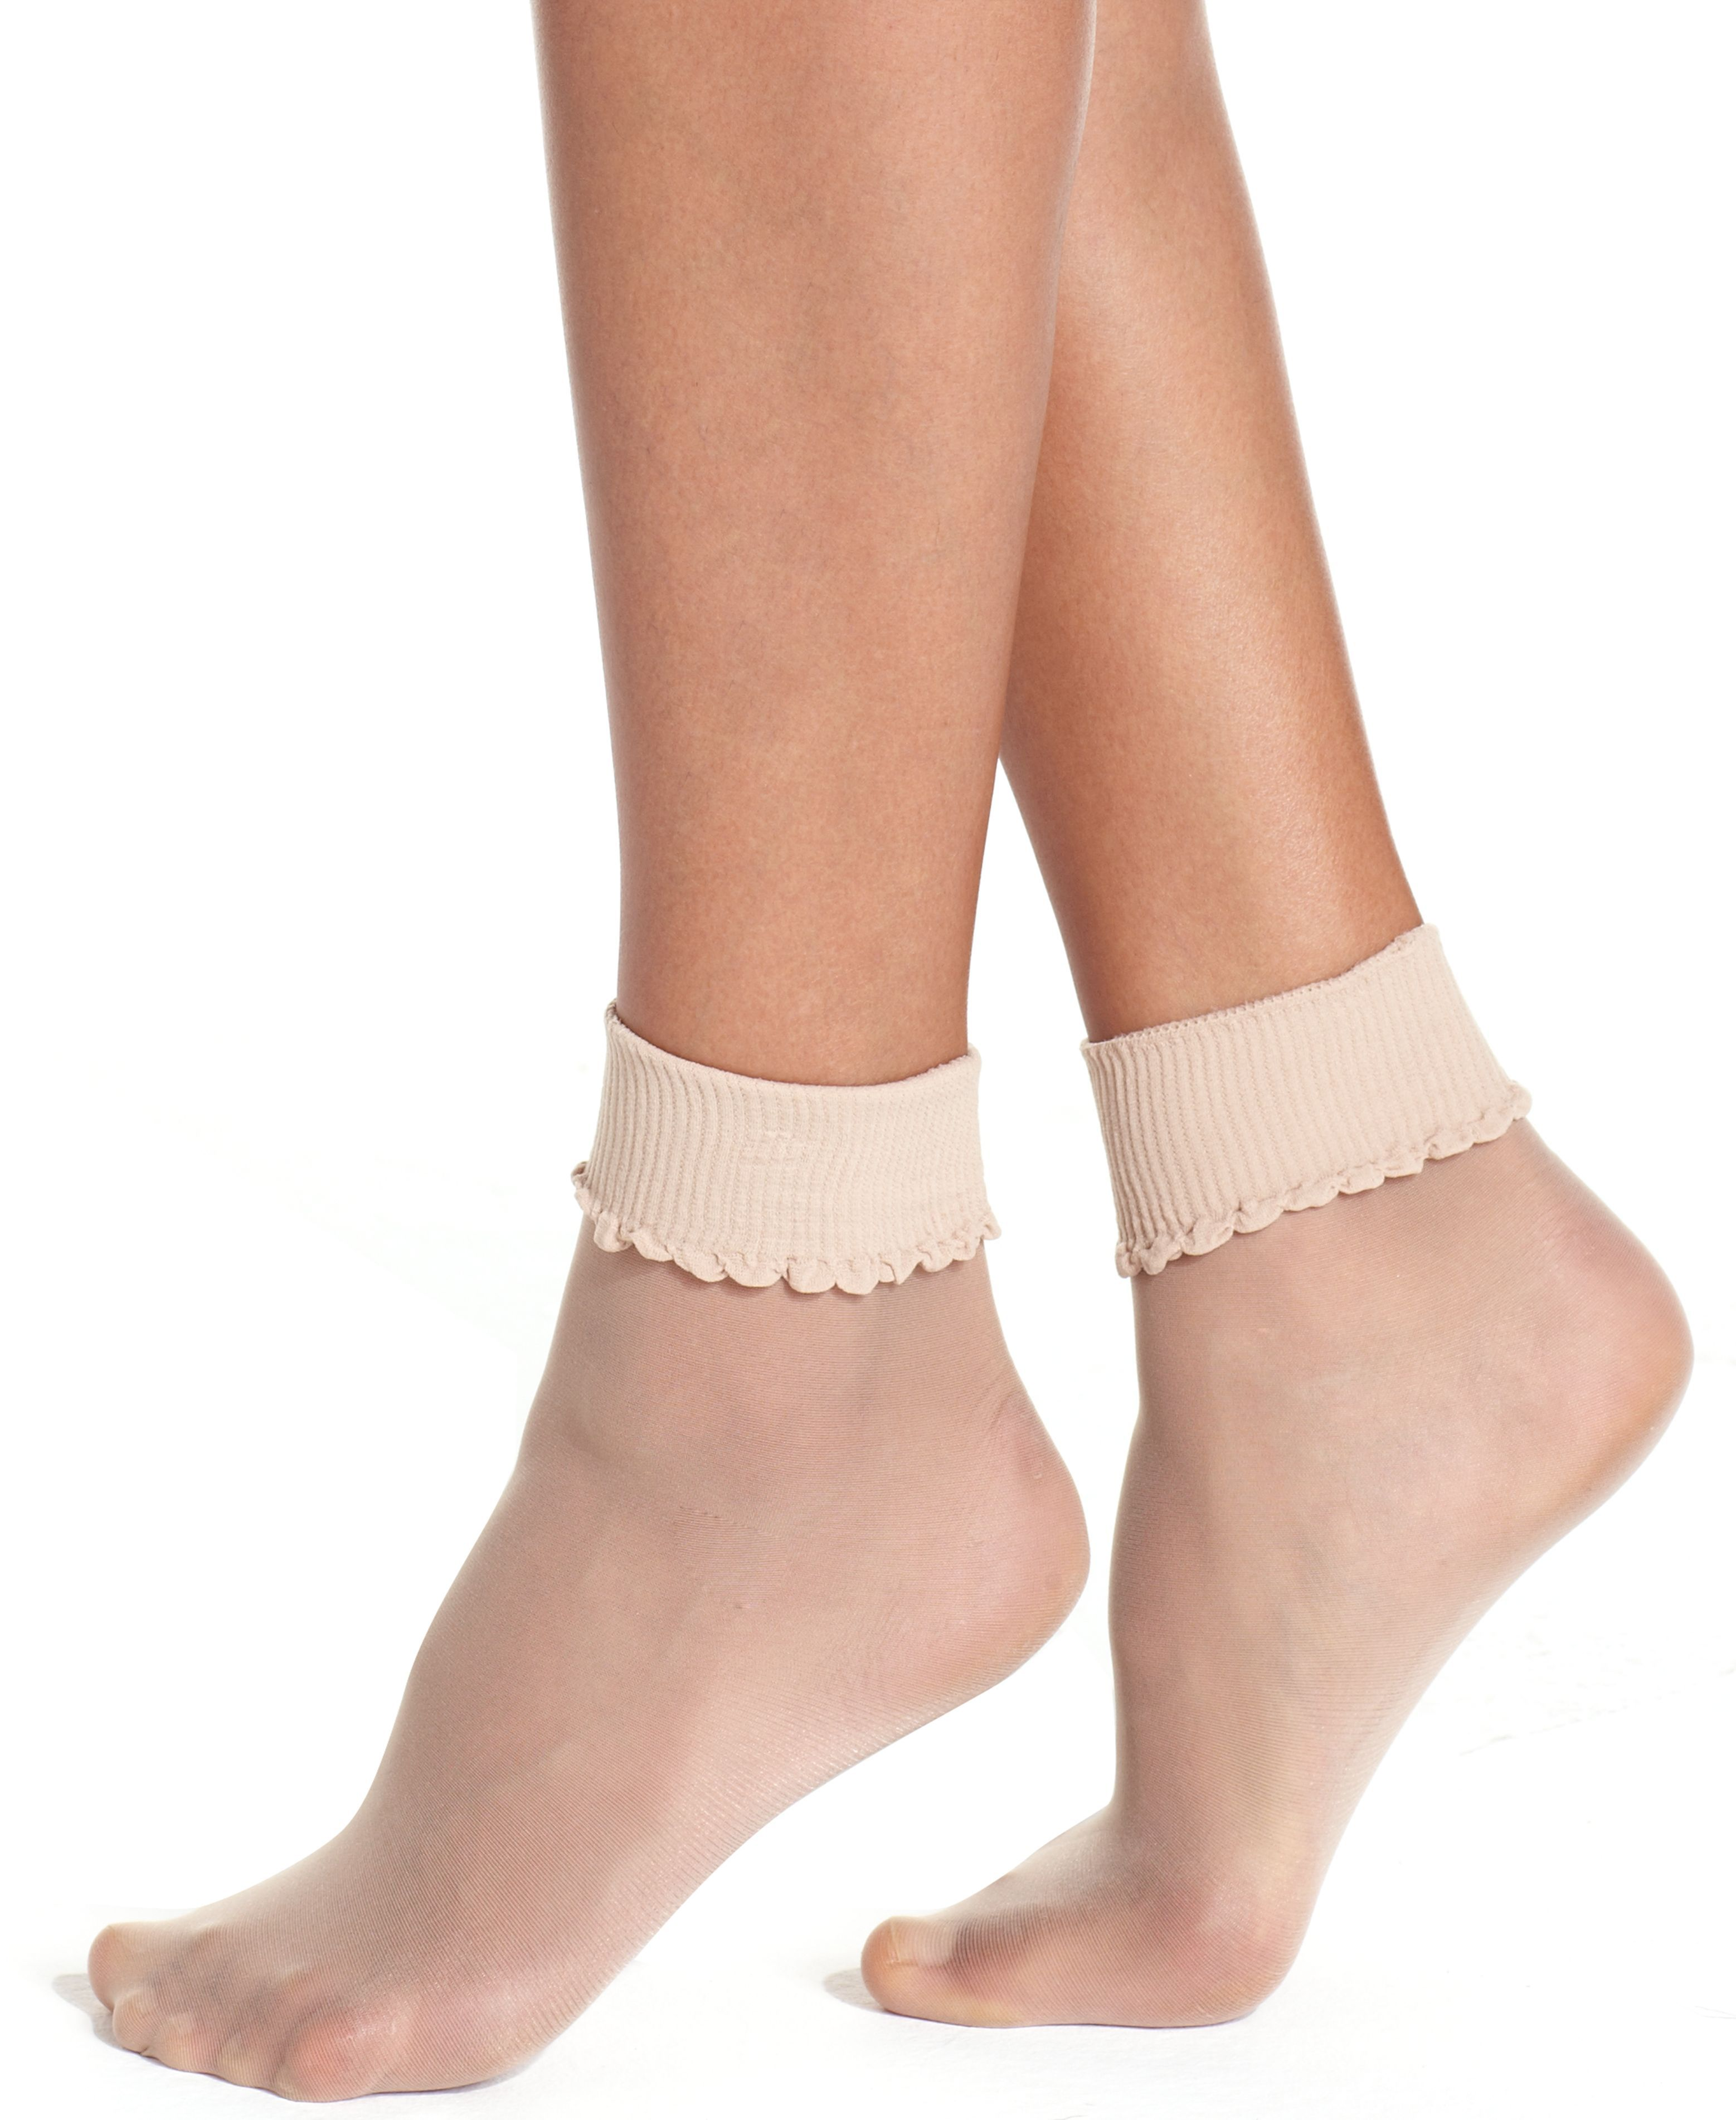 e6438ffa50b0c Berkshire Sheer Sheer Ankle Socks Hosiery 6753